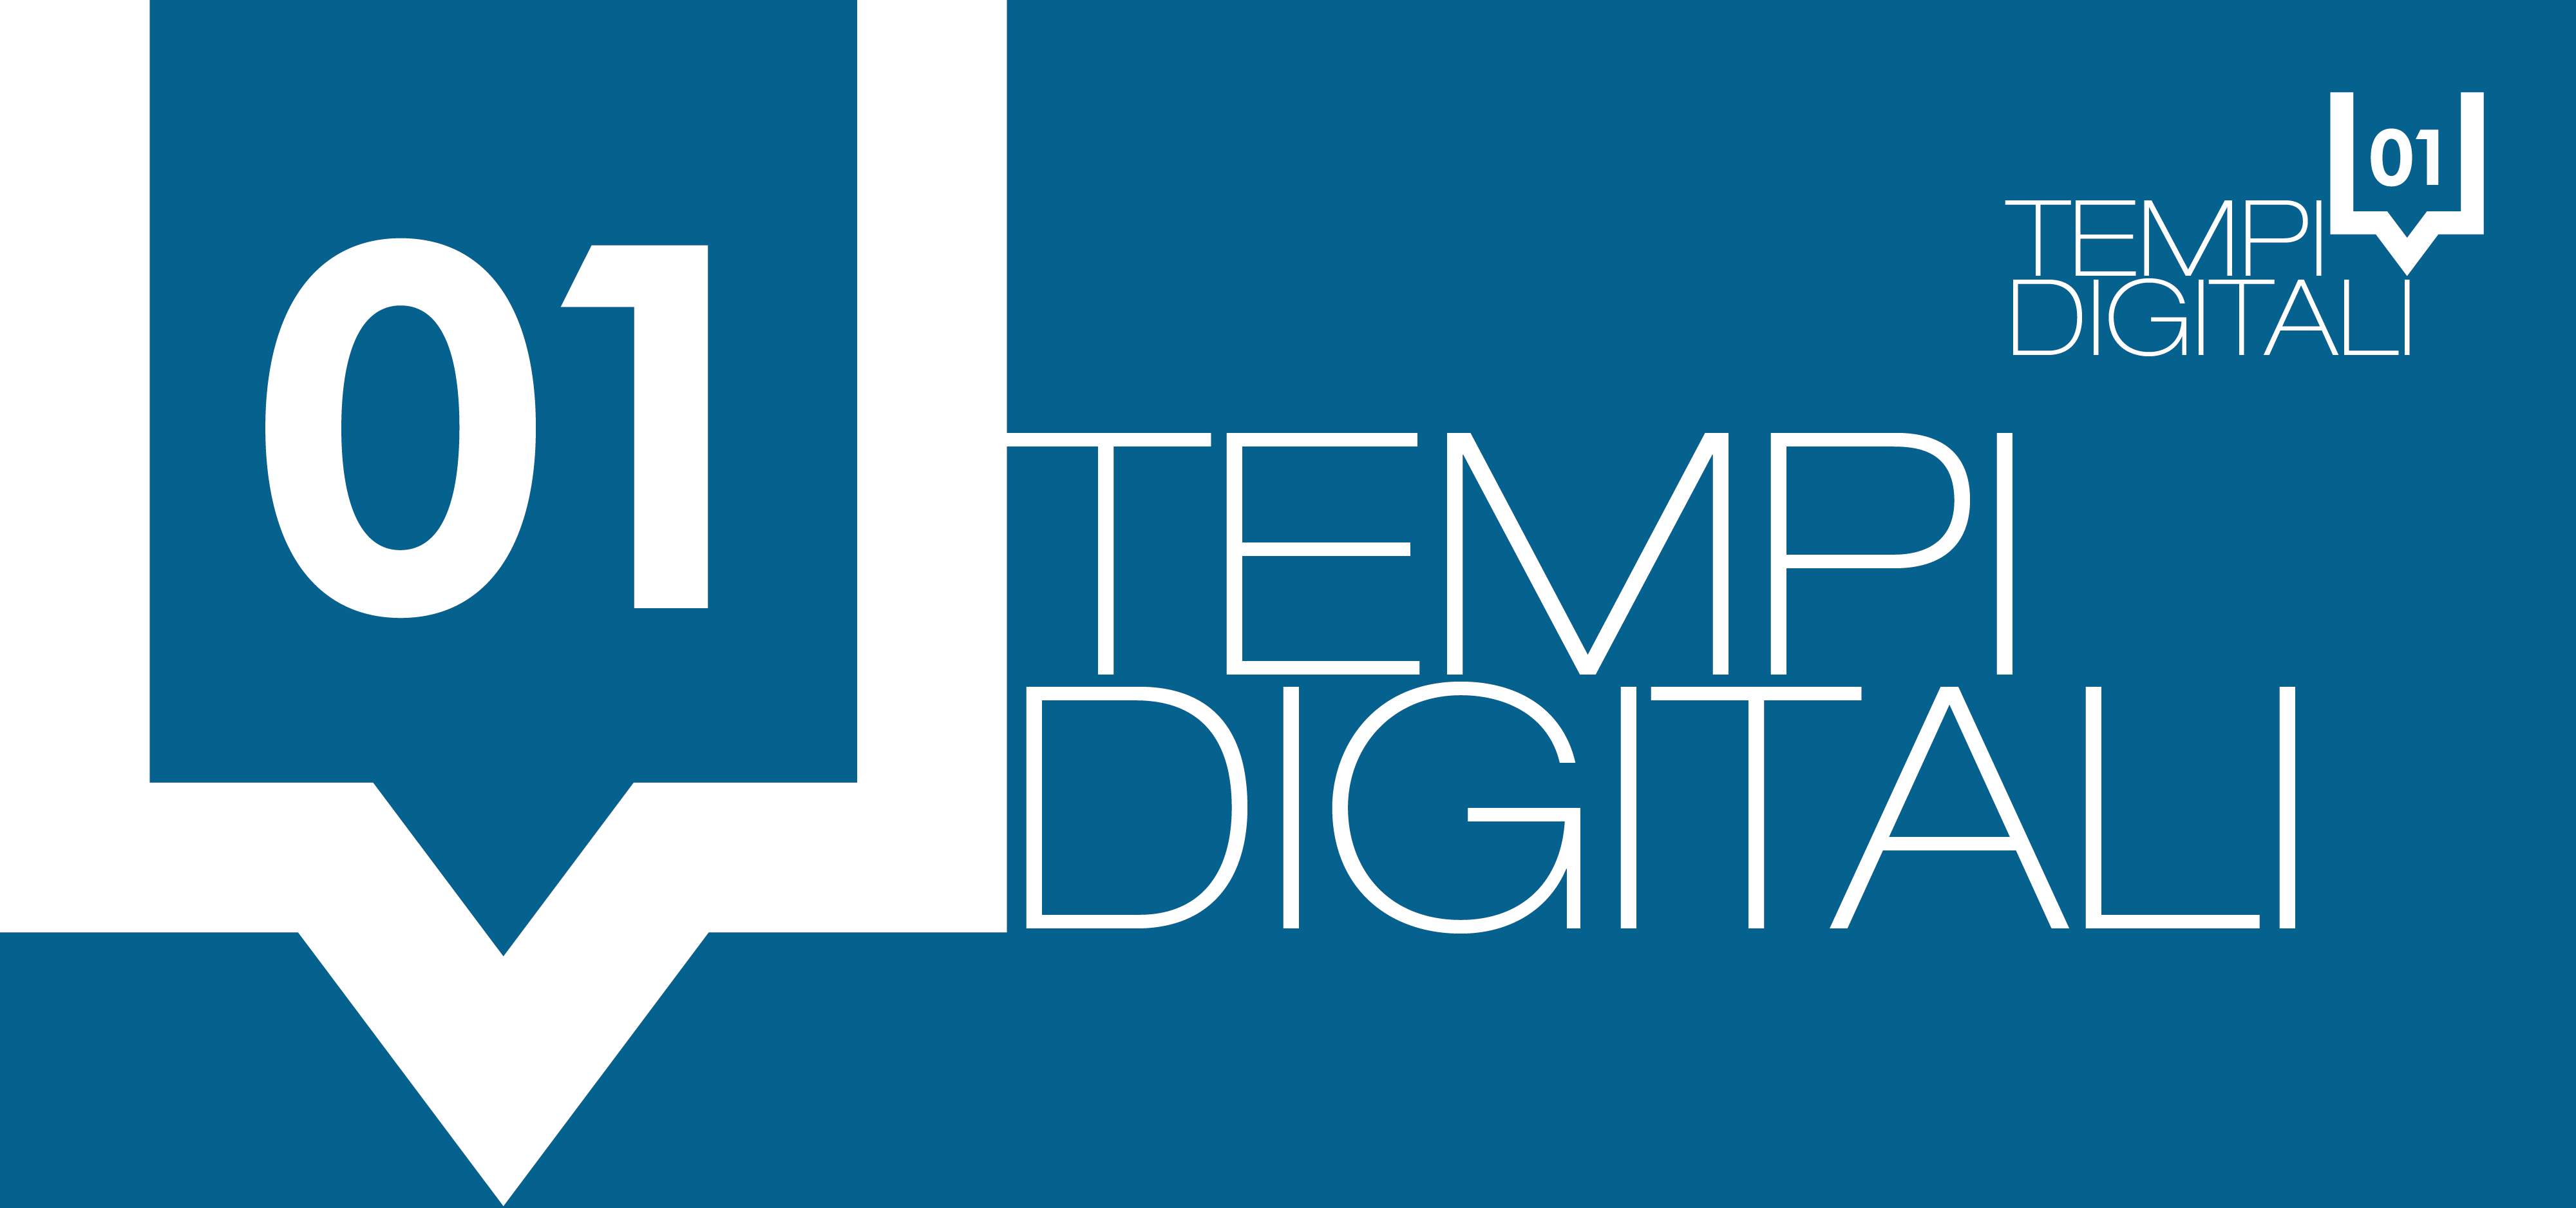 tempi-digitali-05